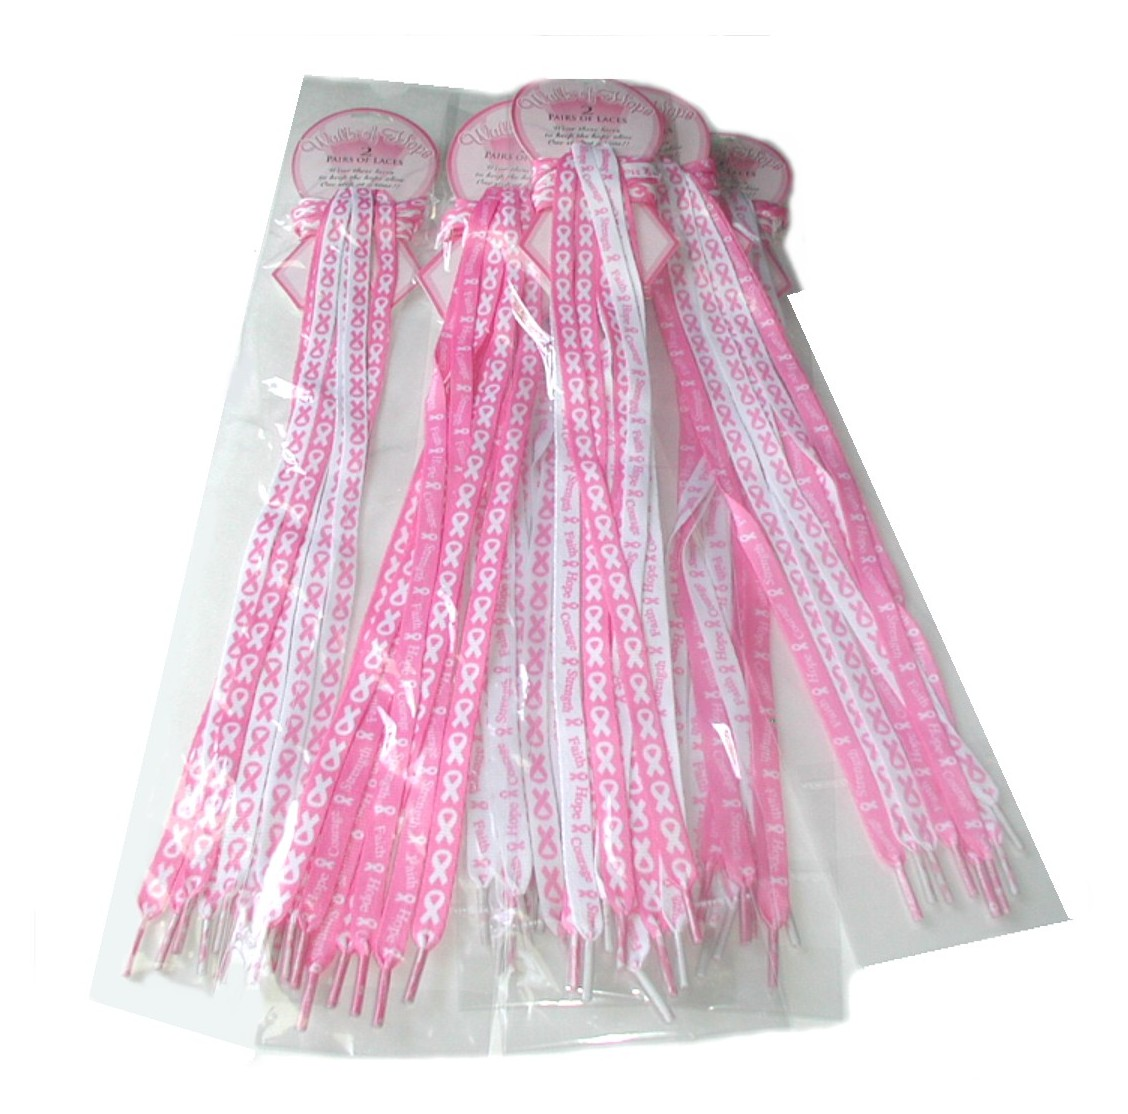 lot 6 pks 12 pair pink ribbon shoe laces breast cancer